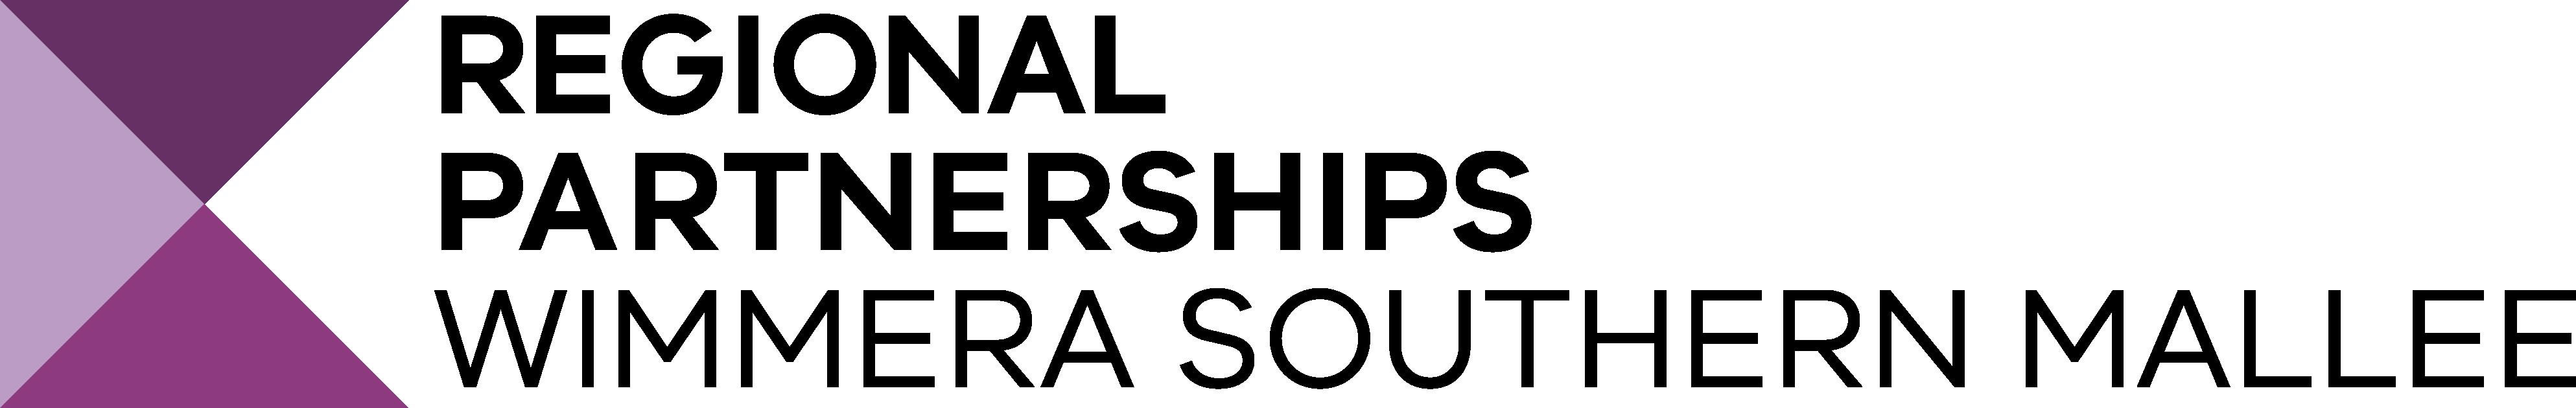 Wimmera Southern Mallee Regional Partnerships Logo